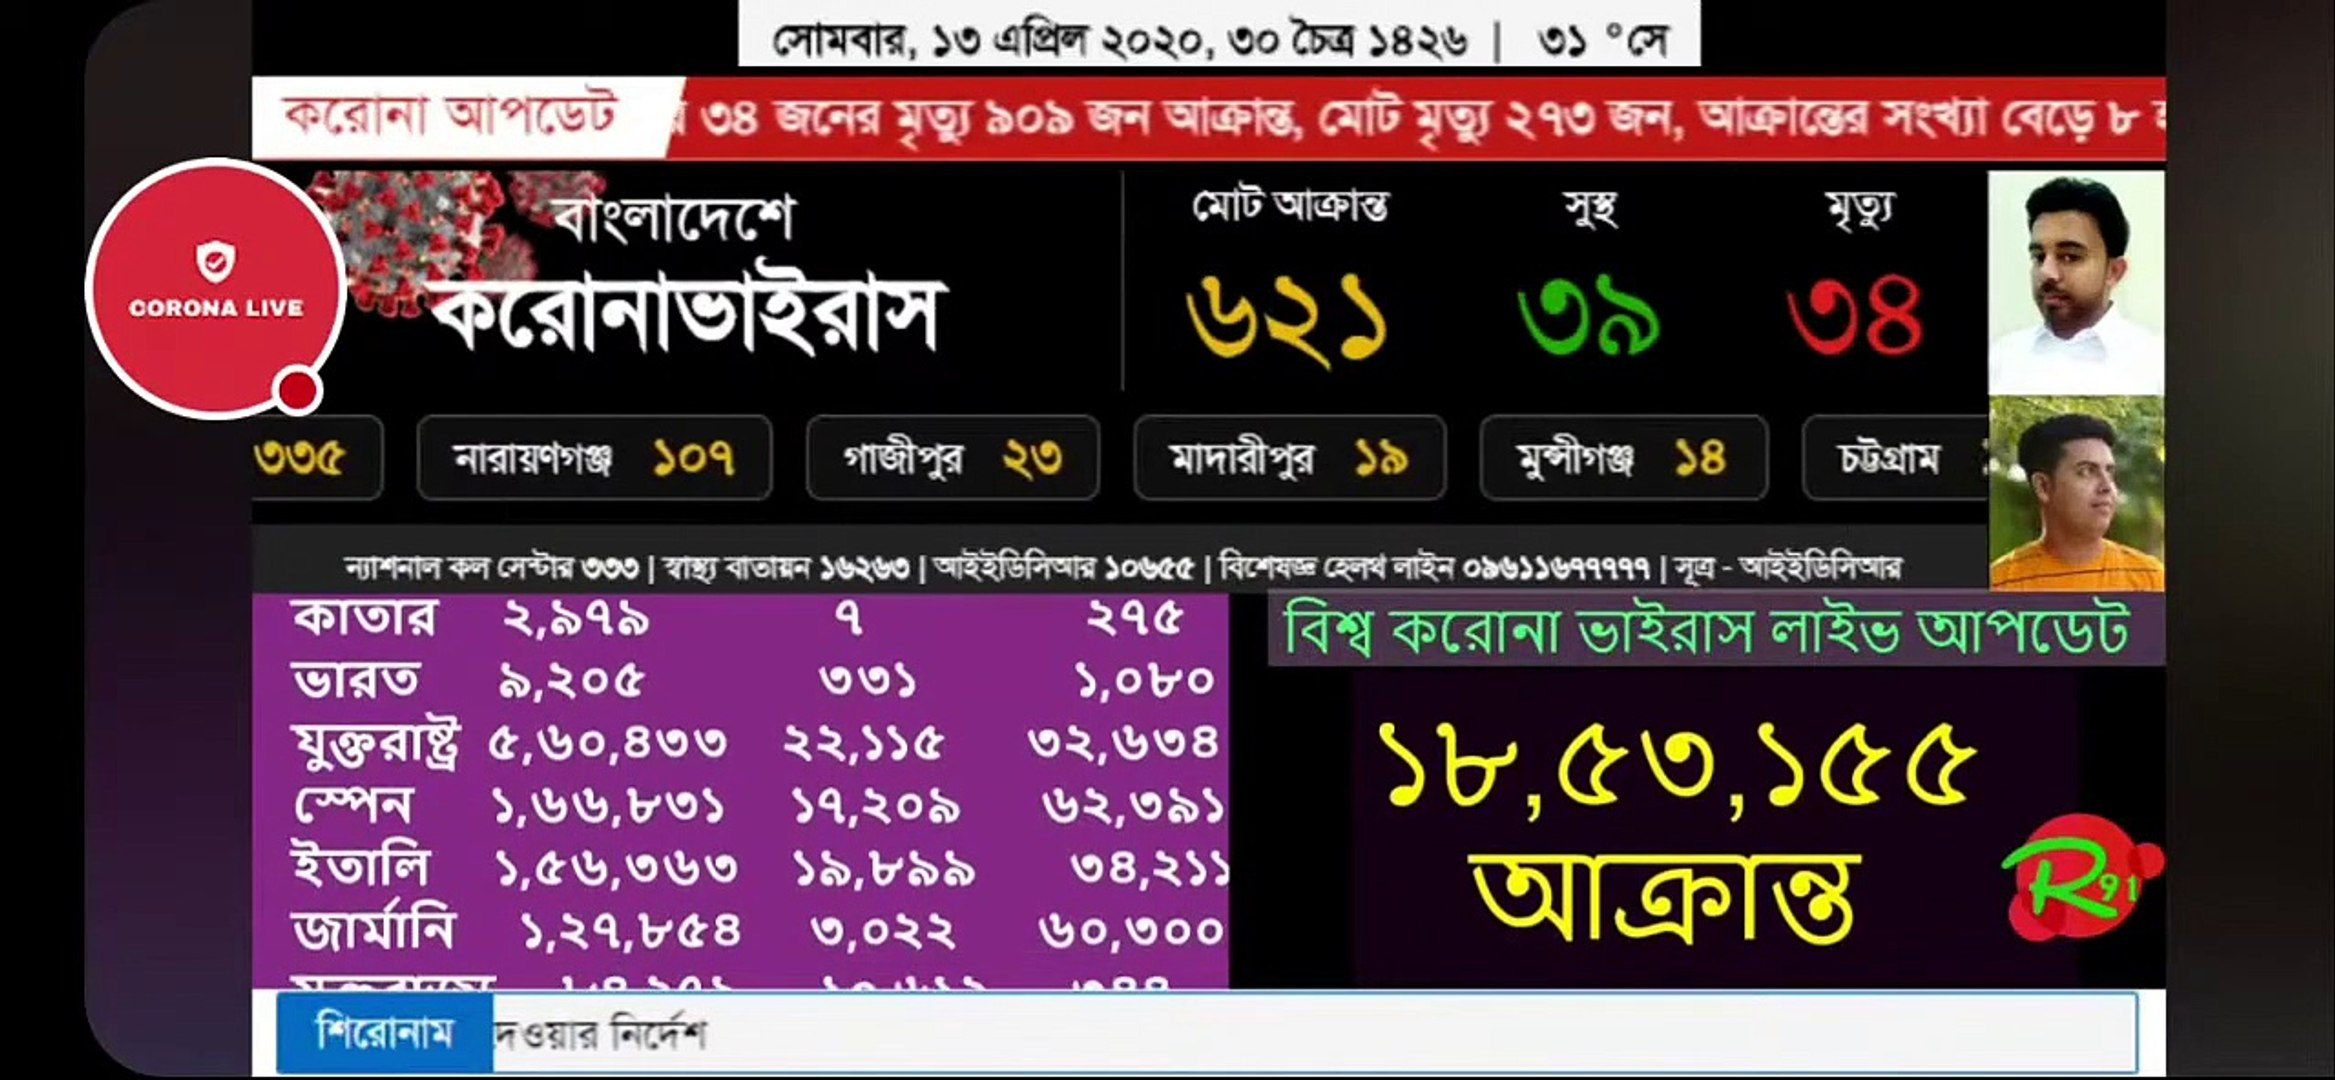 Corona Virus Live Count Bangladesh | Corona Pendamic